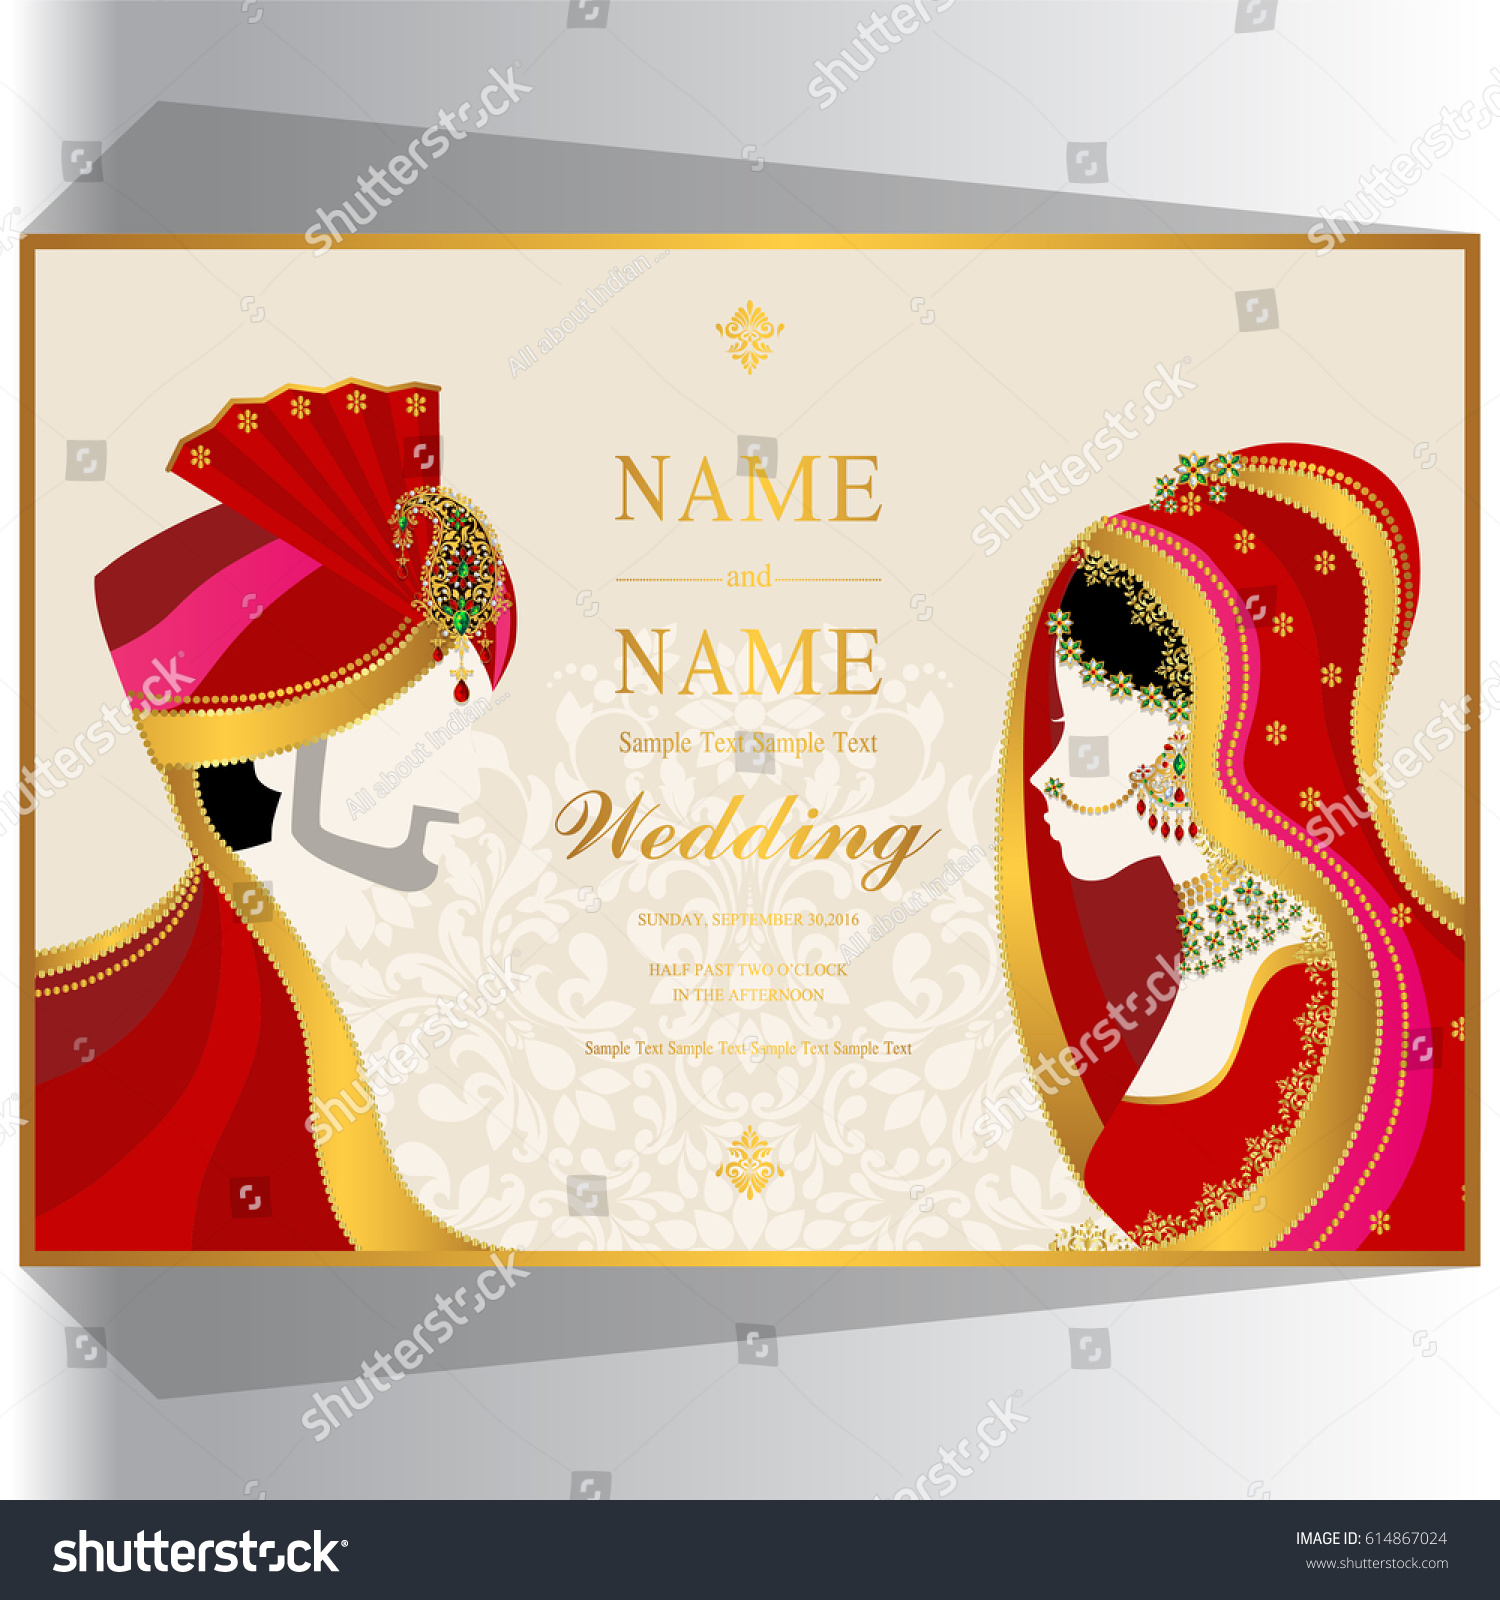 Wedding Invitation Card Templates Indian Man Stock Photo (Photo ...